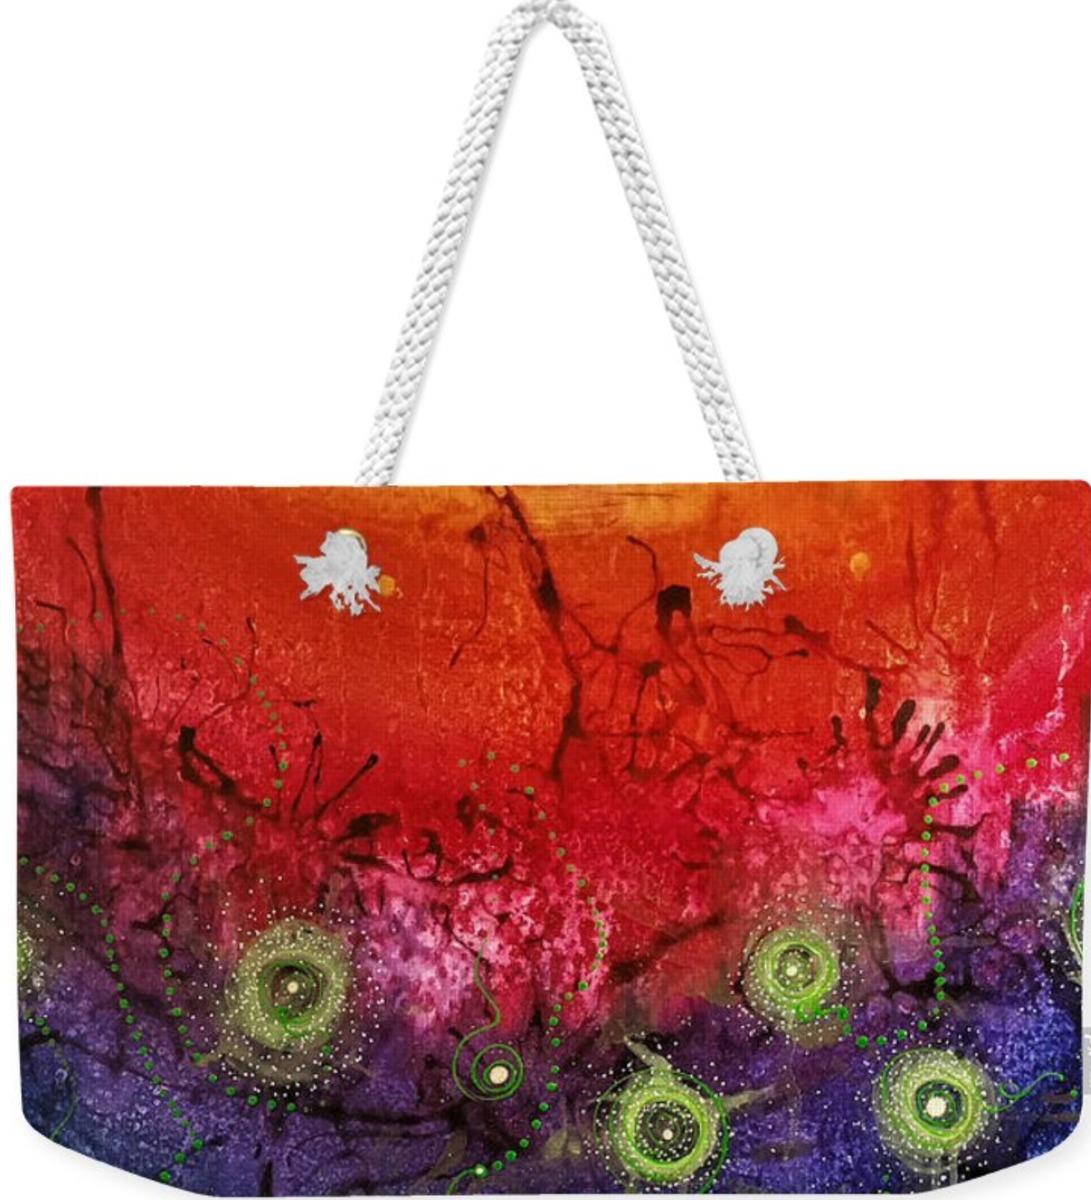 Light of Awareness Tote Bag (large view)